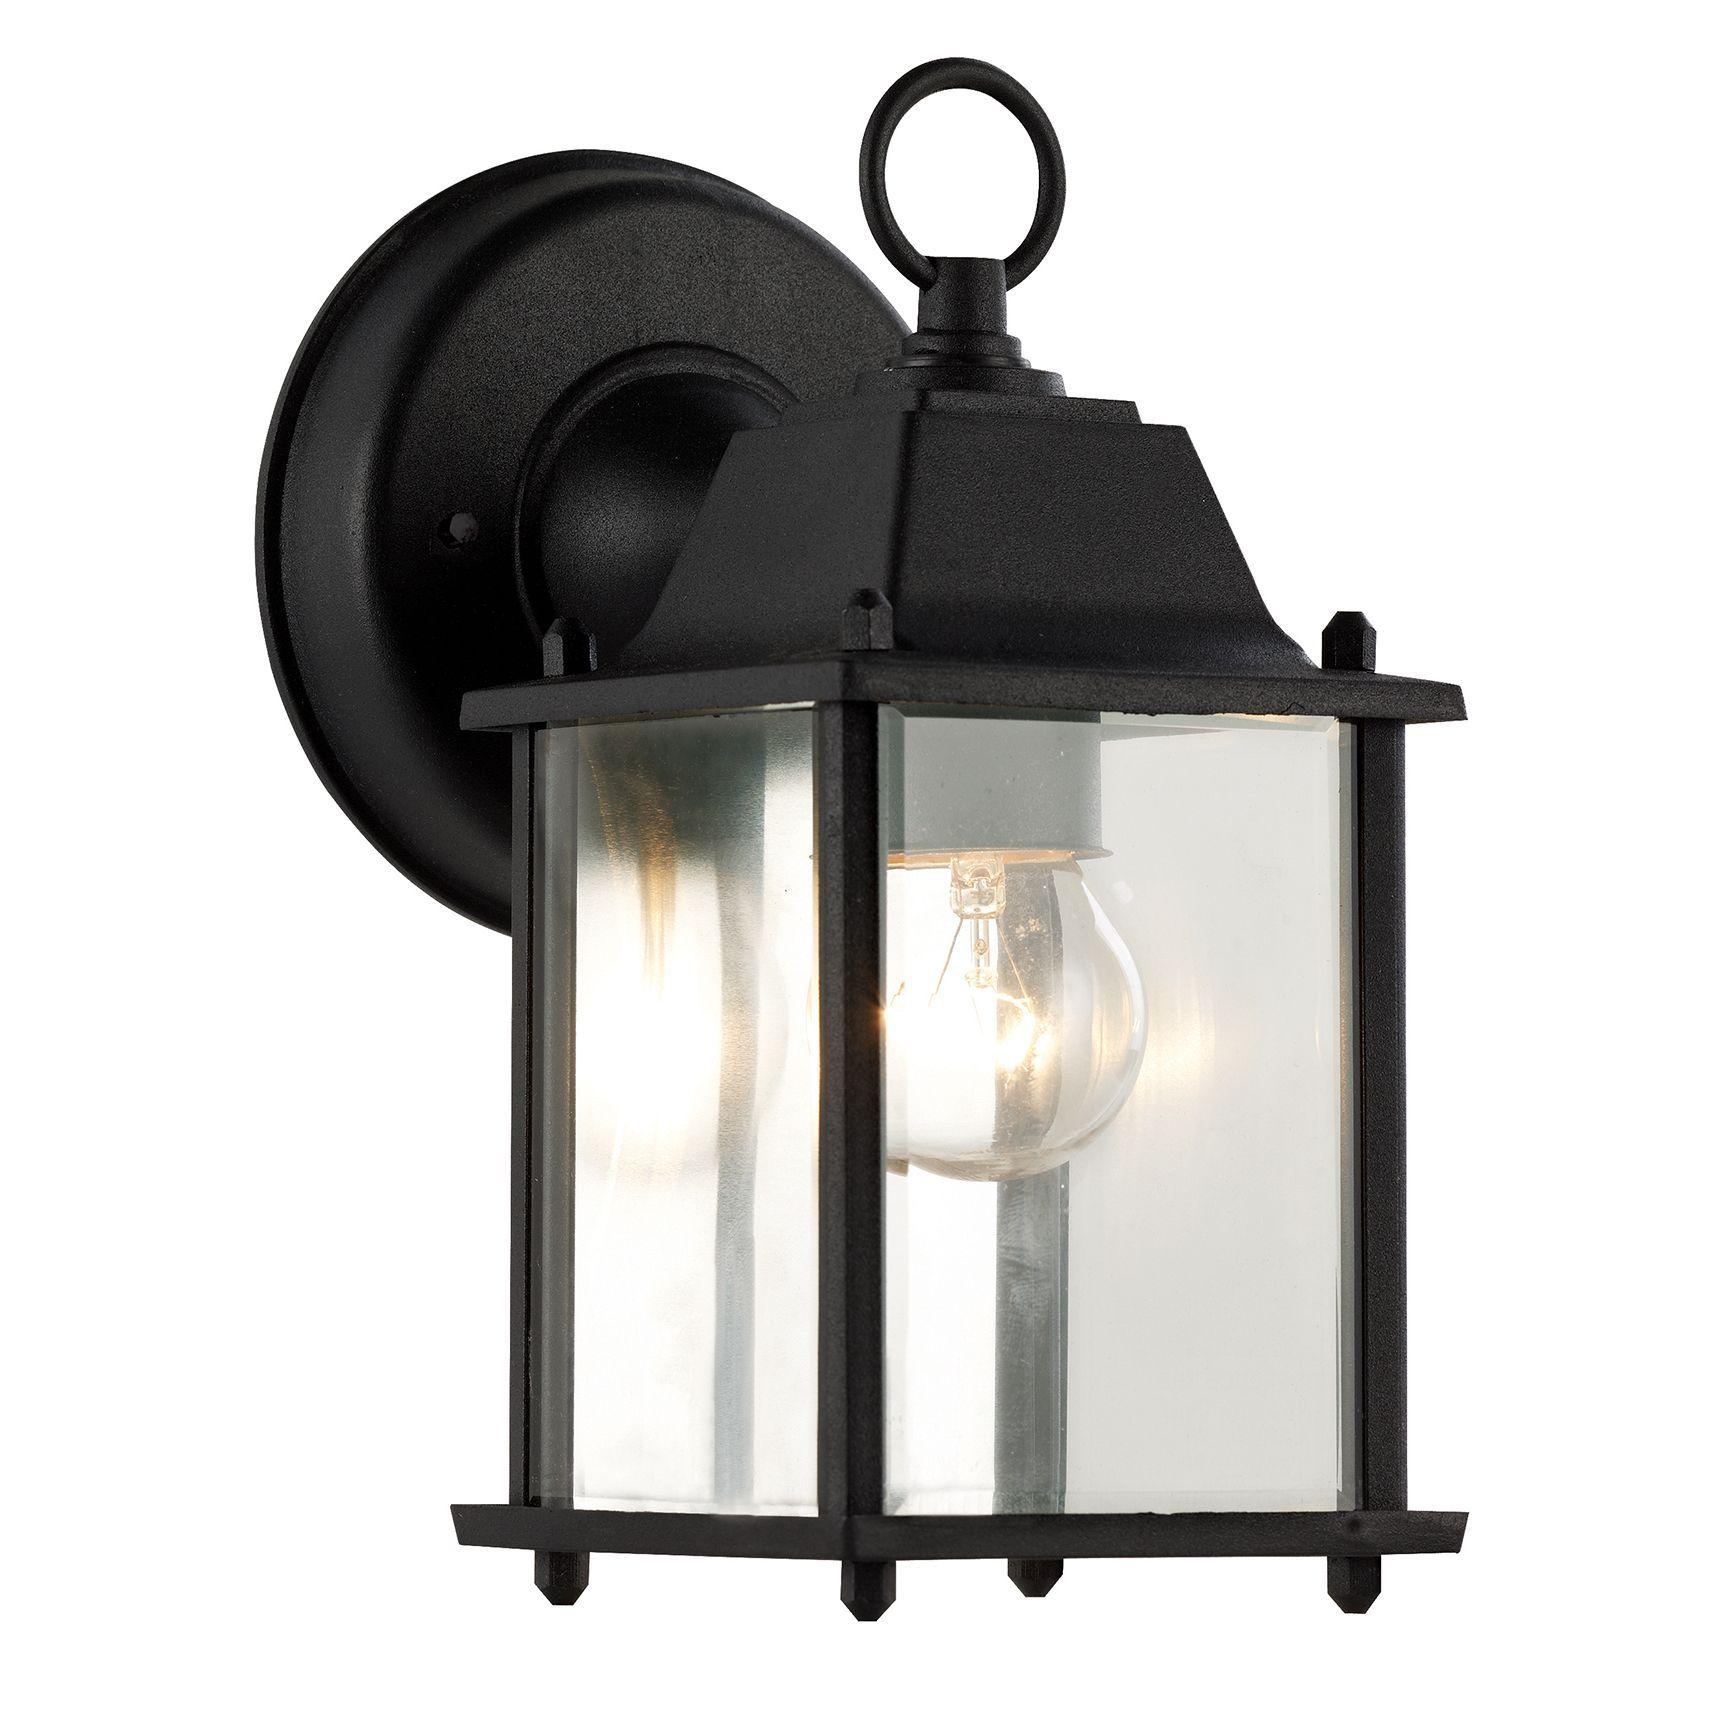 House remodeling  sc 1 st  Pinterest & Bel Air Lighting CB-40455-BK 1 Light Porch Light With Clear Beveled ...